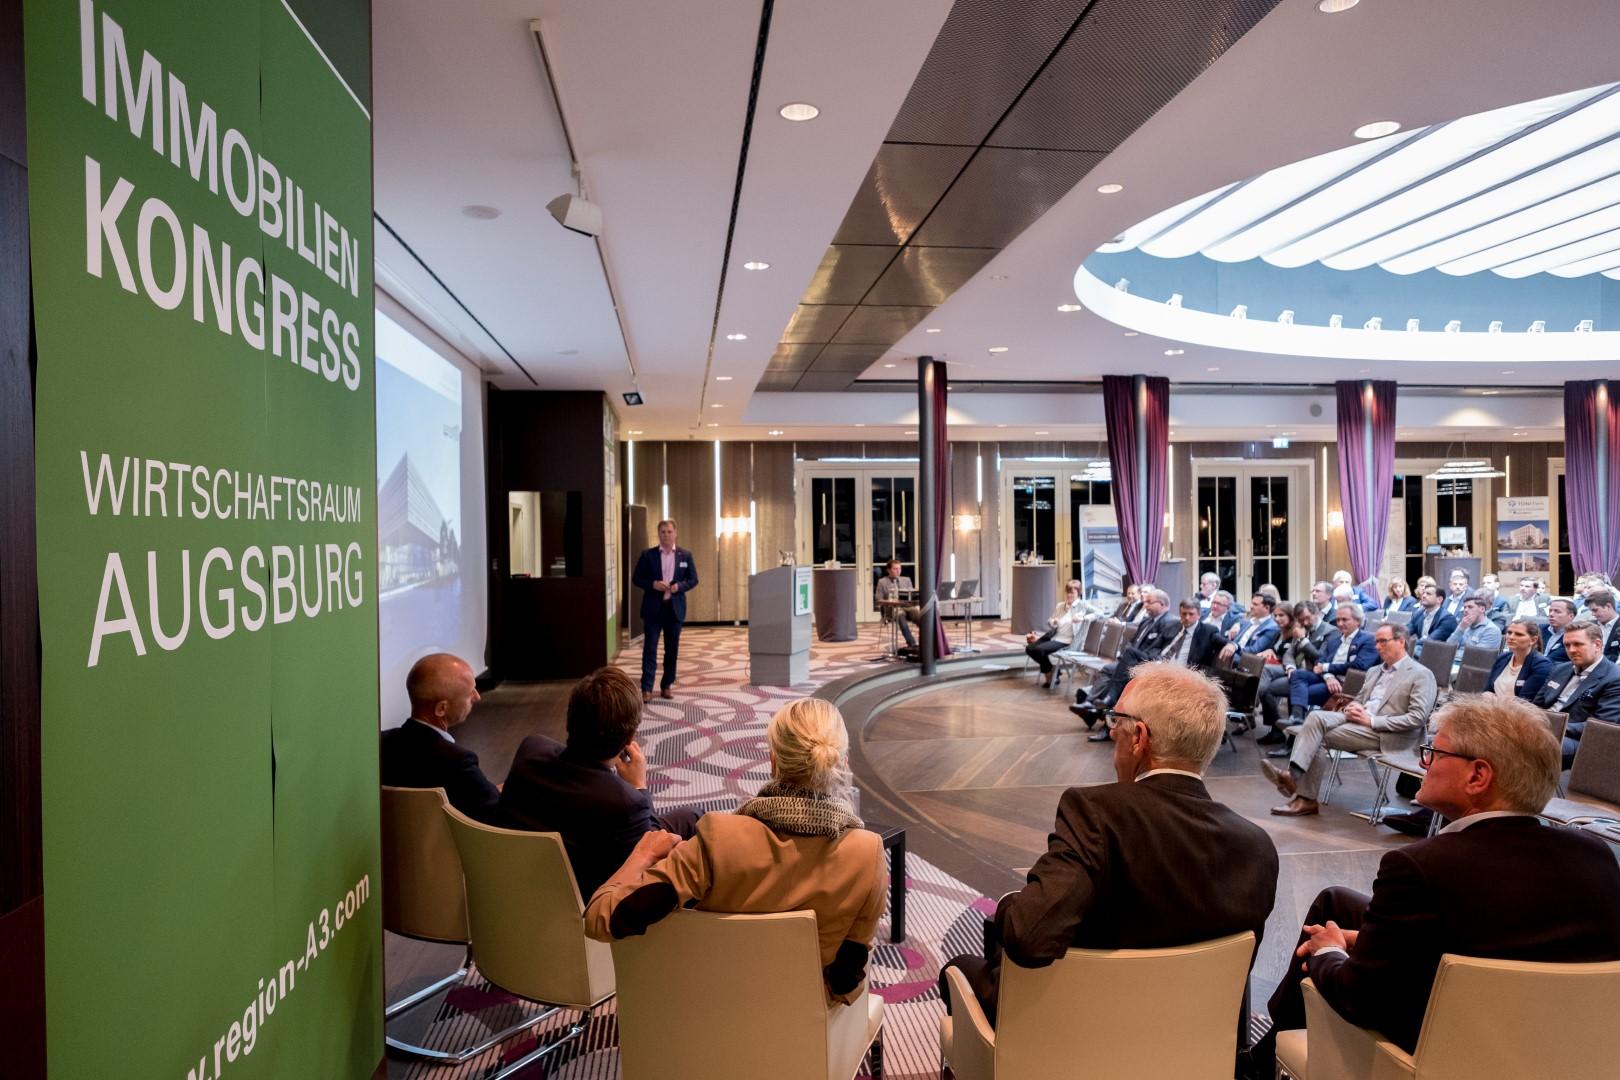 Immobilienkongress A³ 2018: Arena der Immobilienlöwen